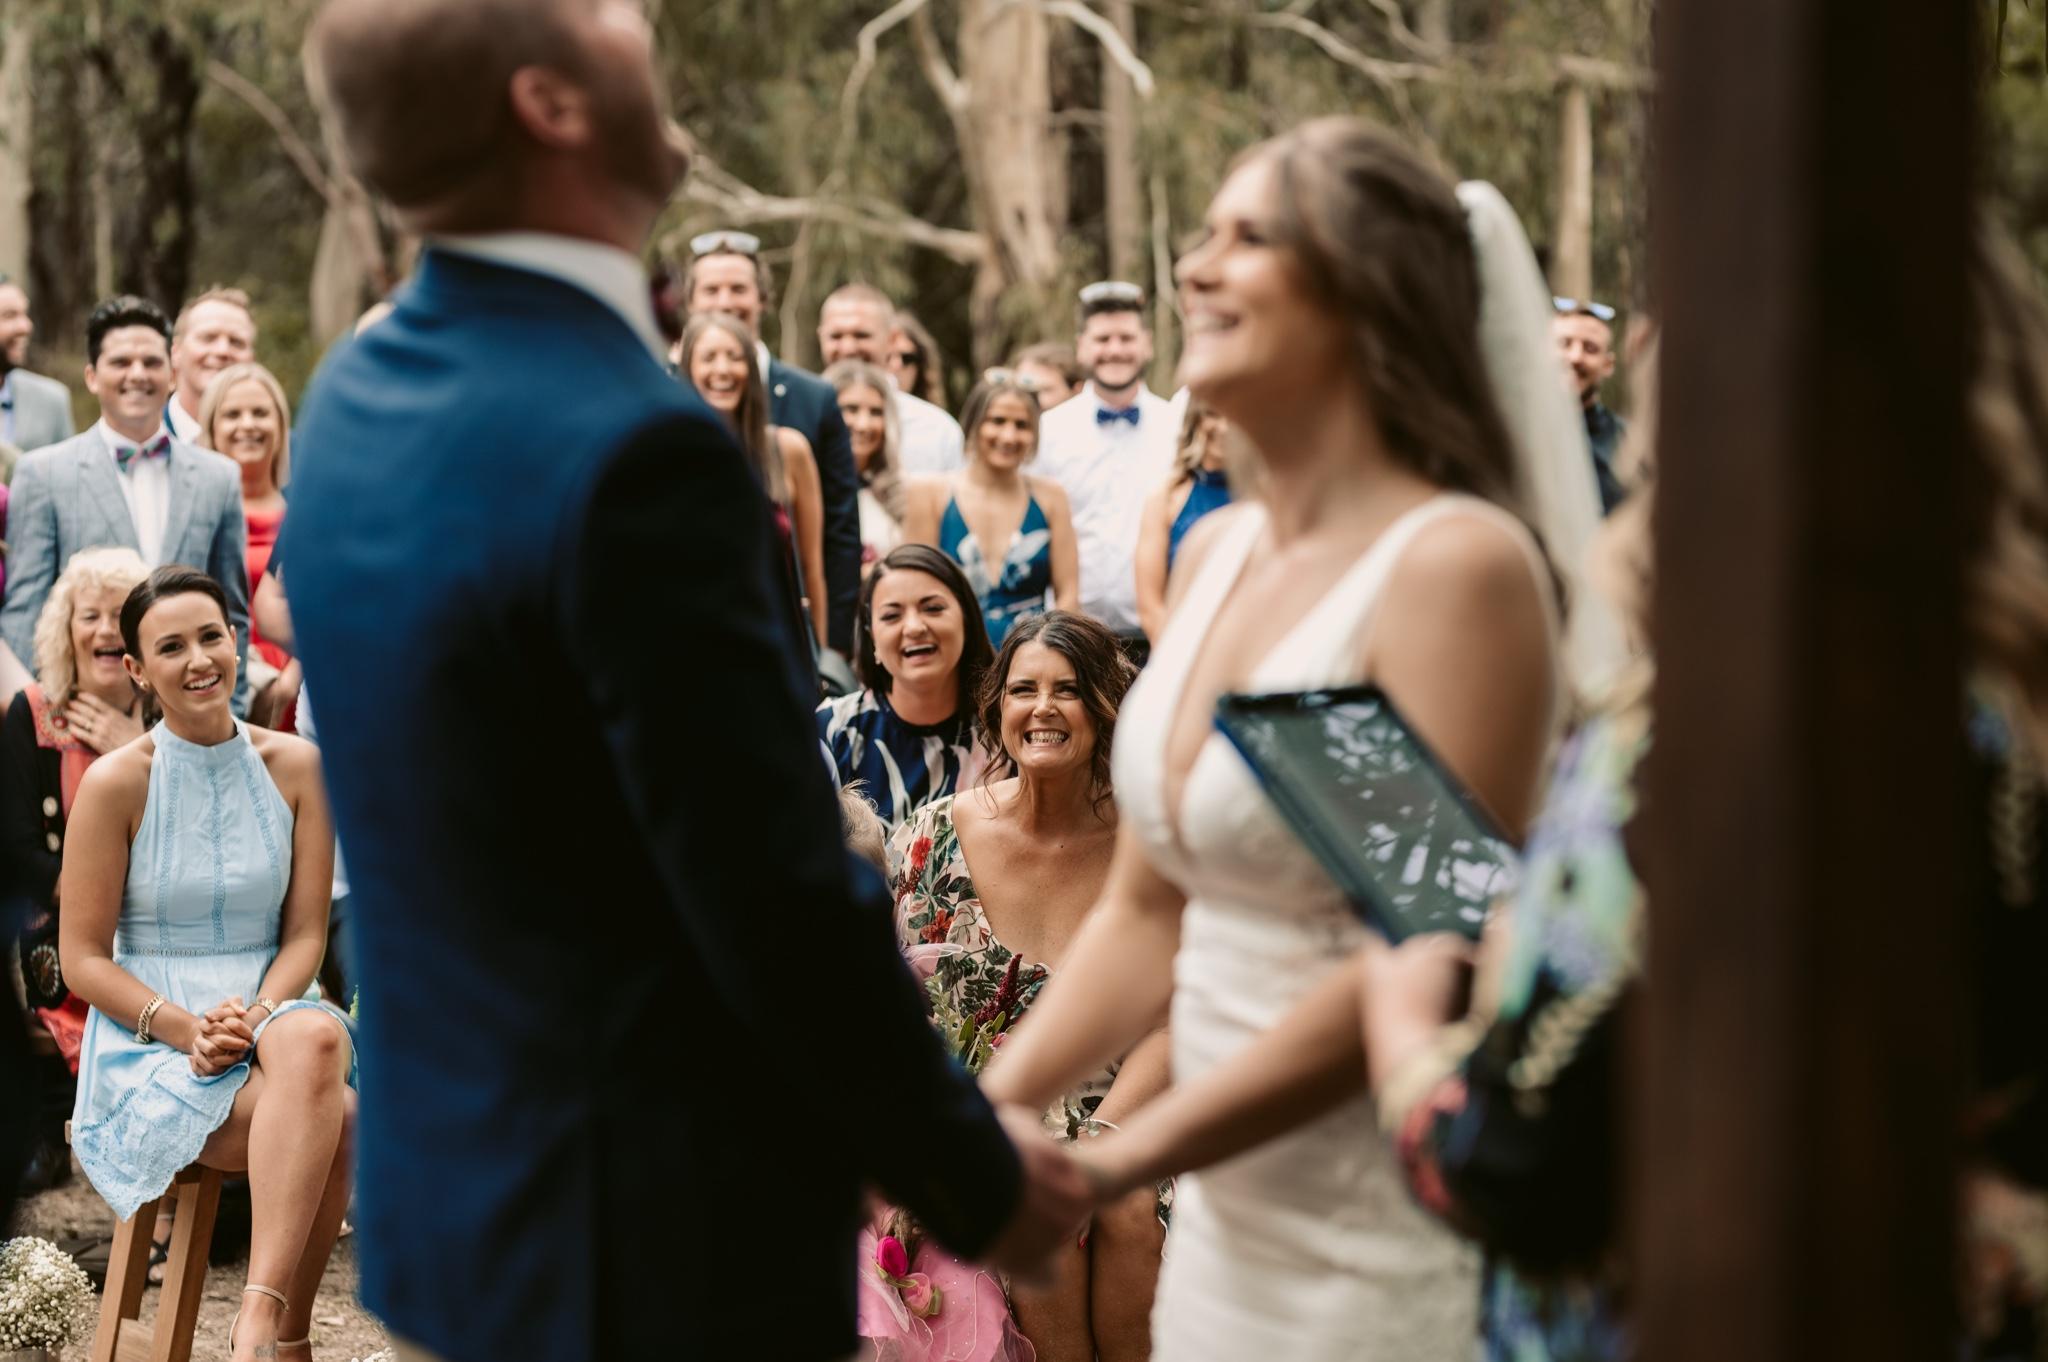 Mornington Peninsula Wedding Photography51.jpg